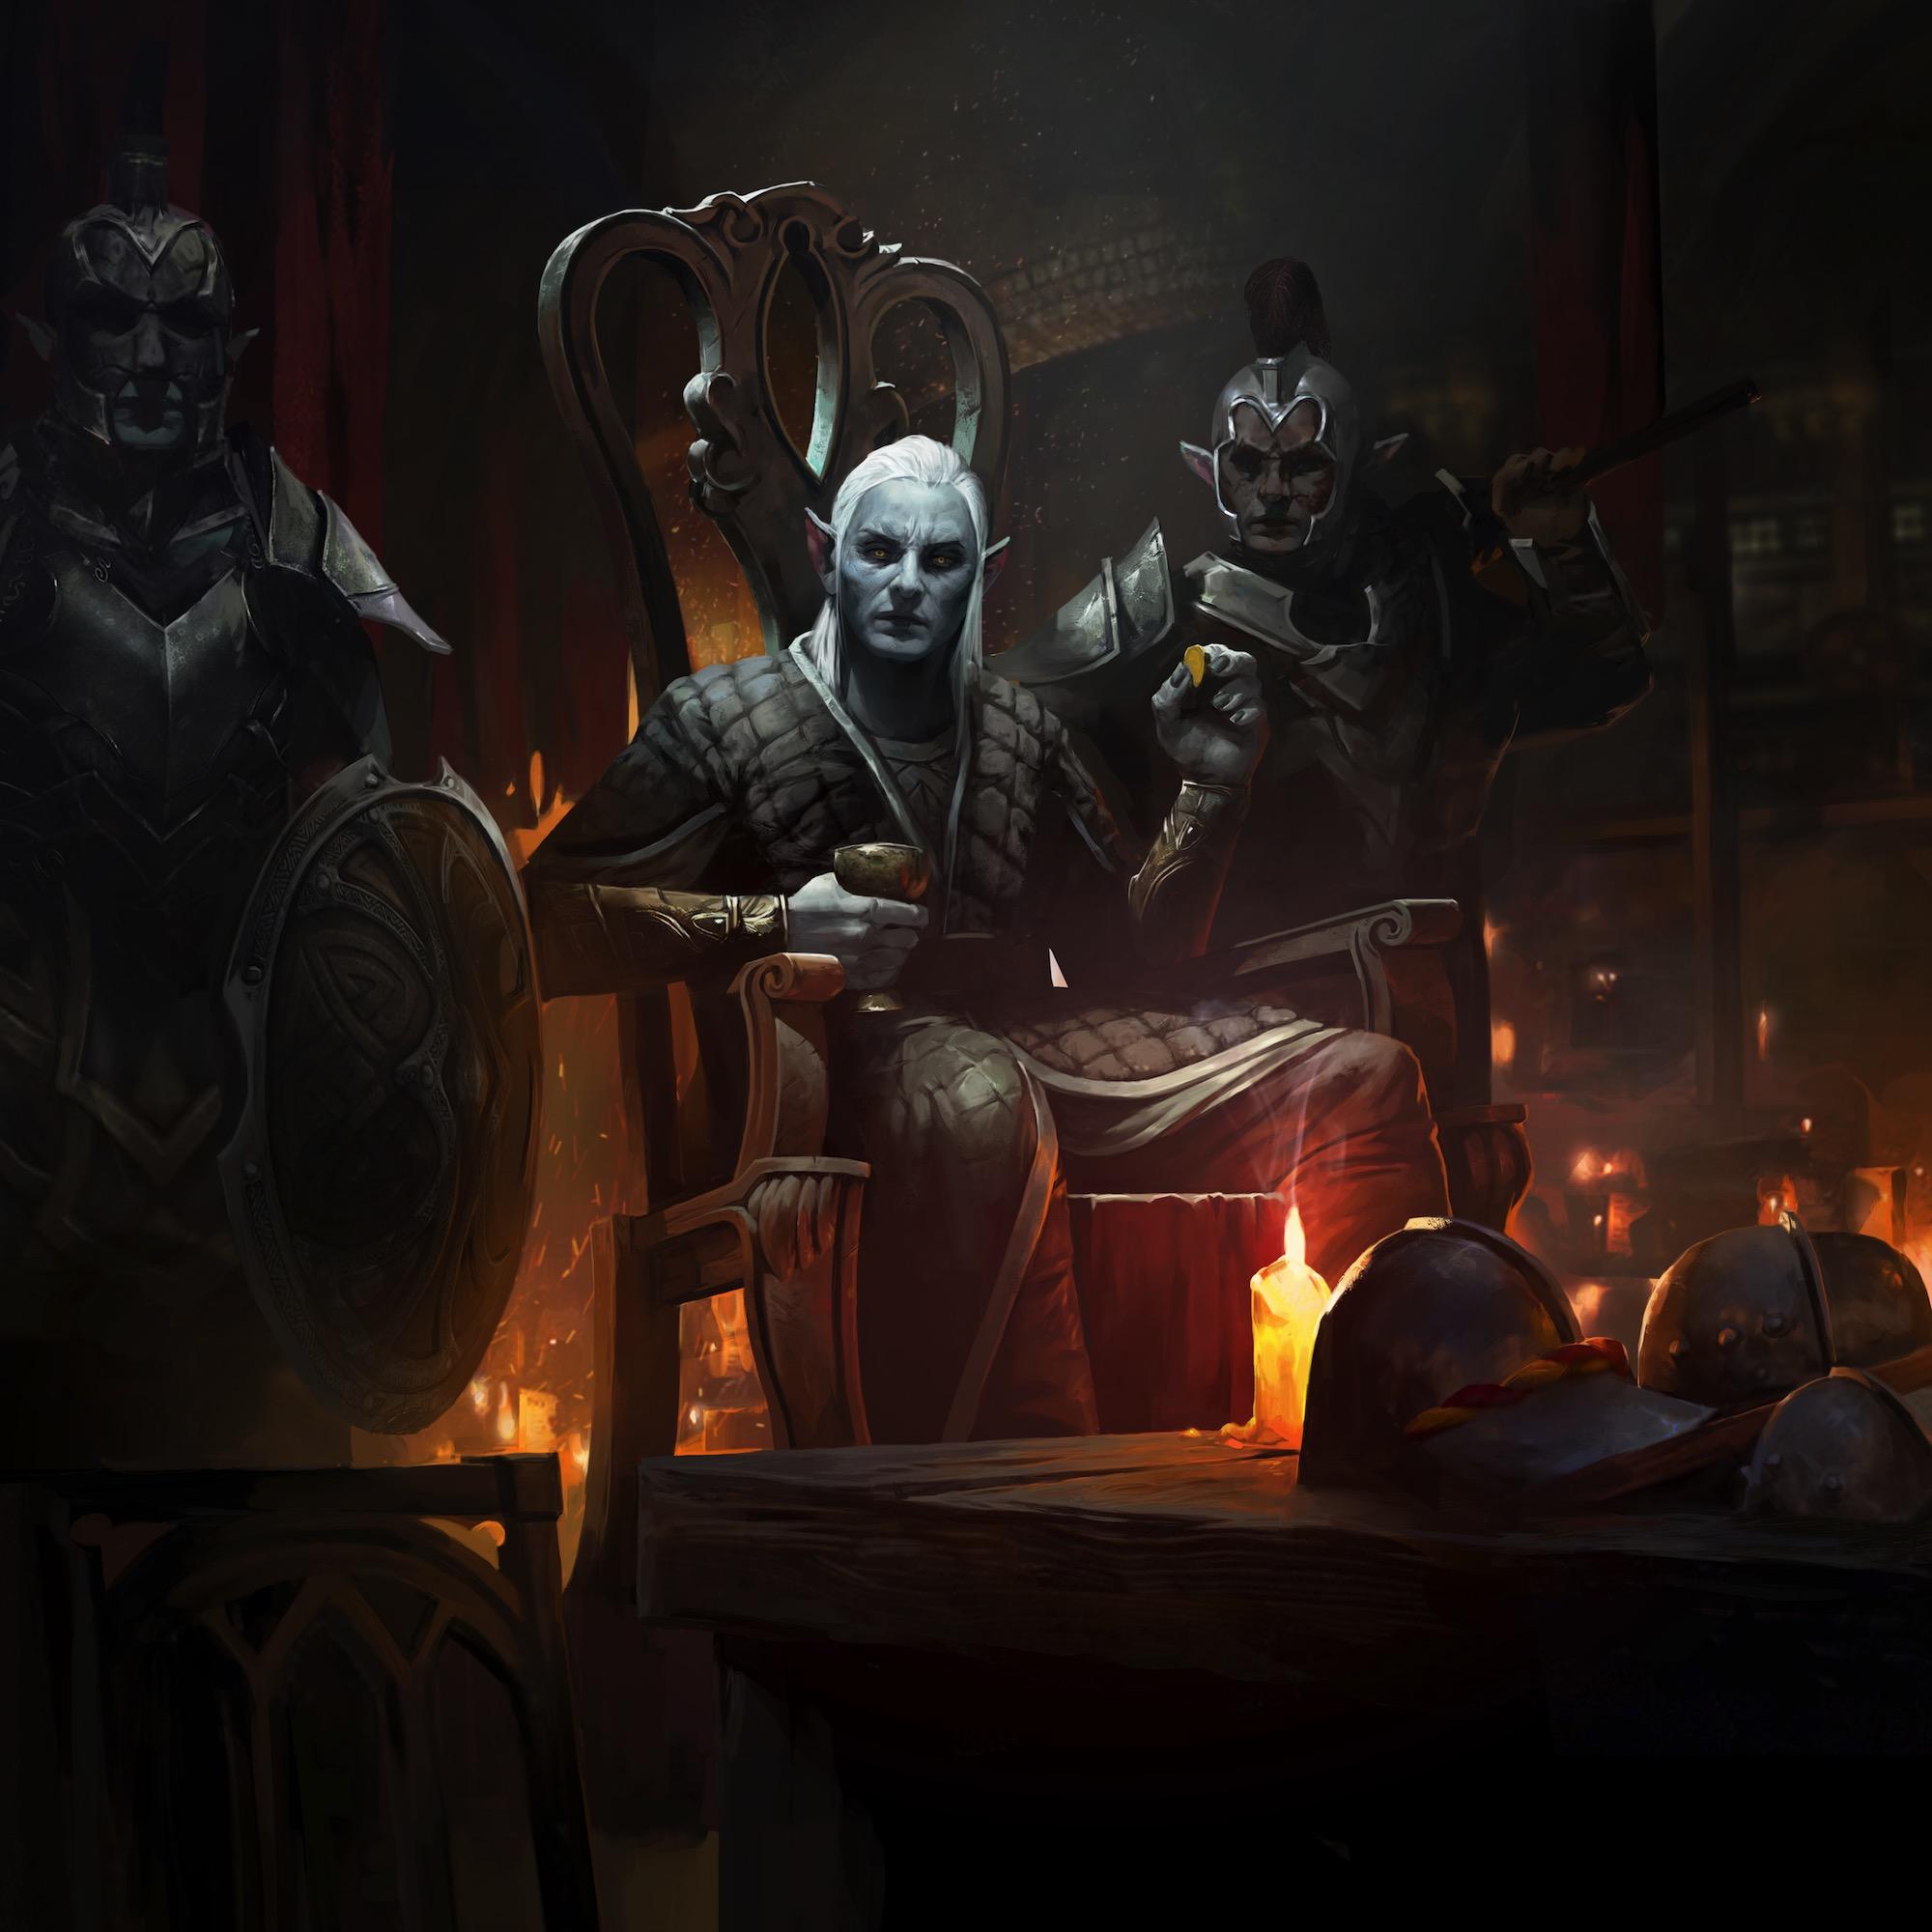 The Fall Of Troy Wallpaper The Elder Scrolls Legends Nuare Studio